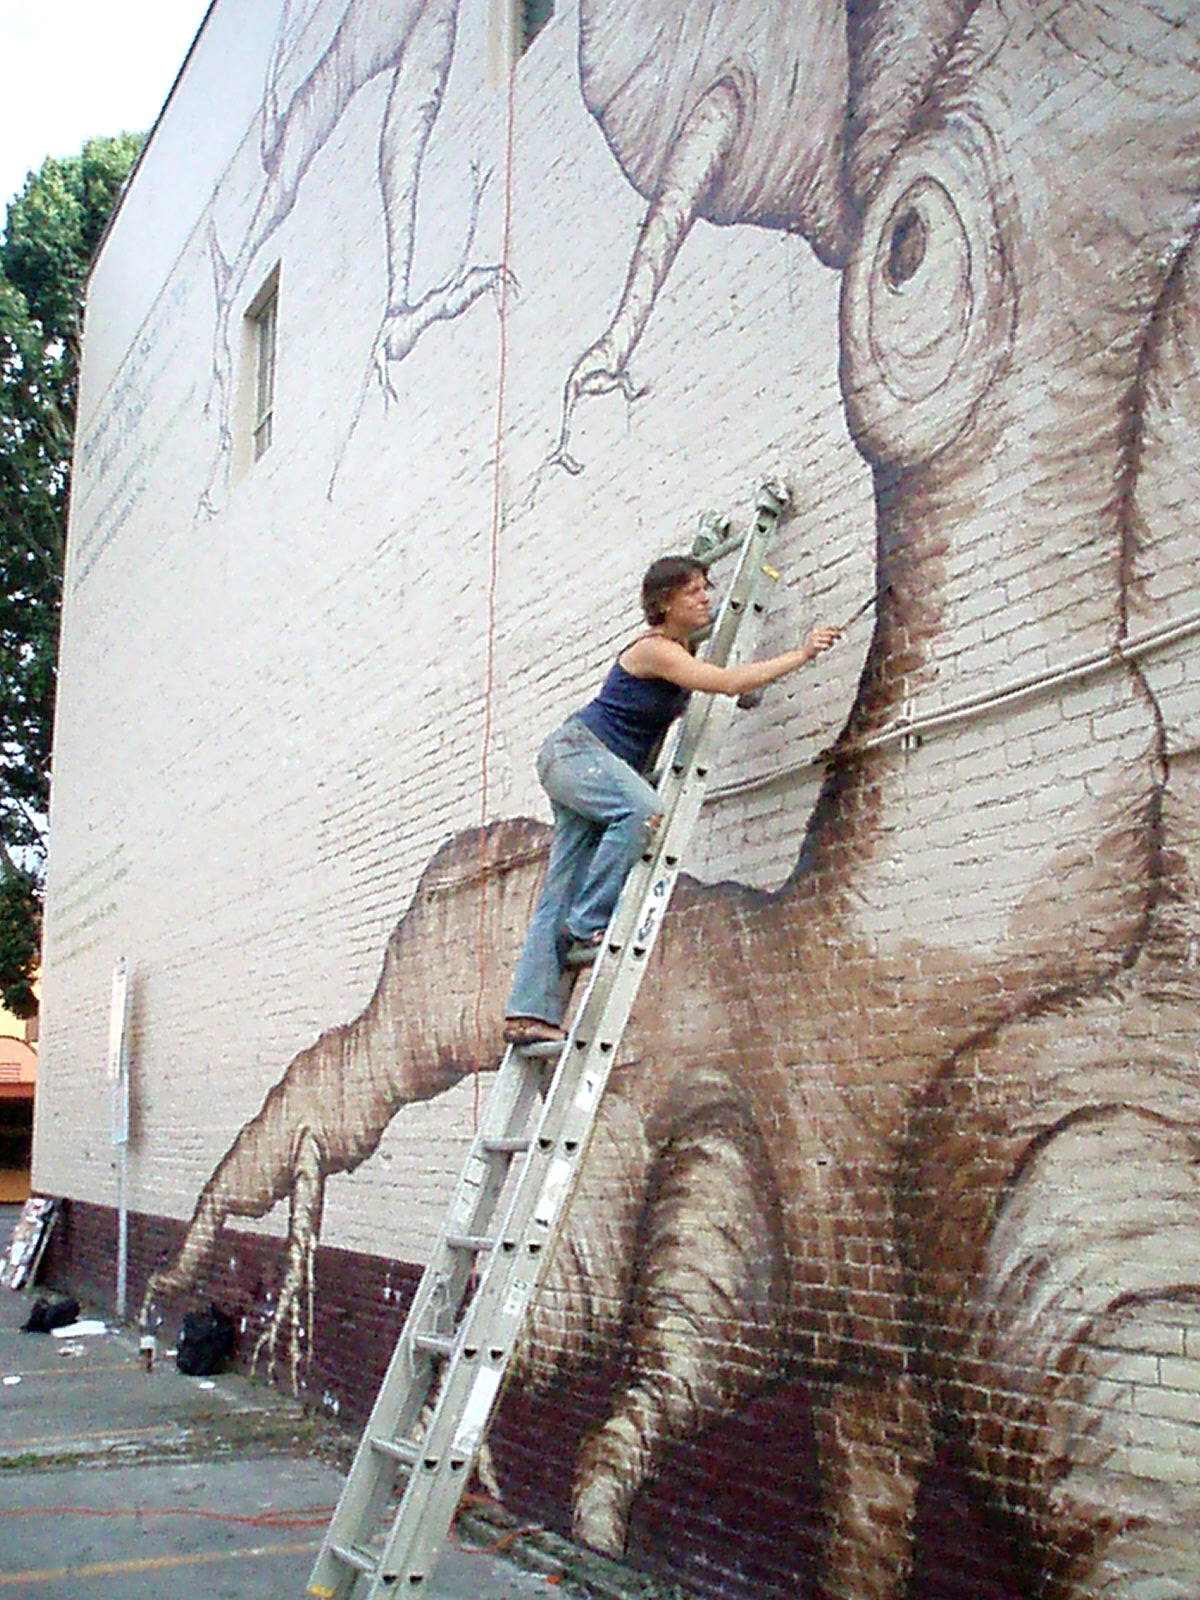 Oly Rafah Mural Carrie.jpg